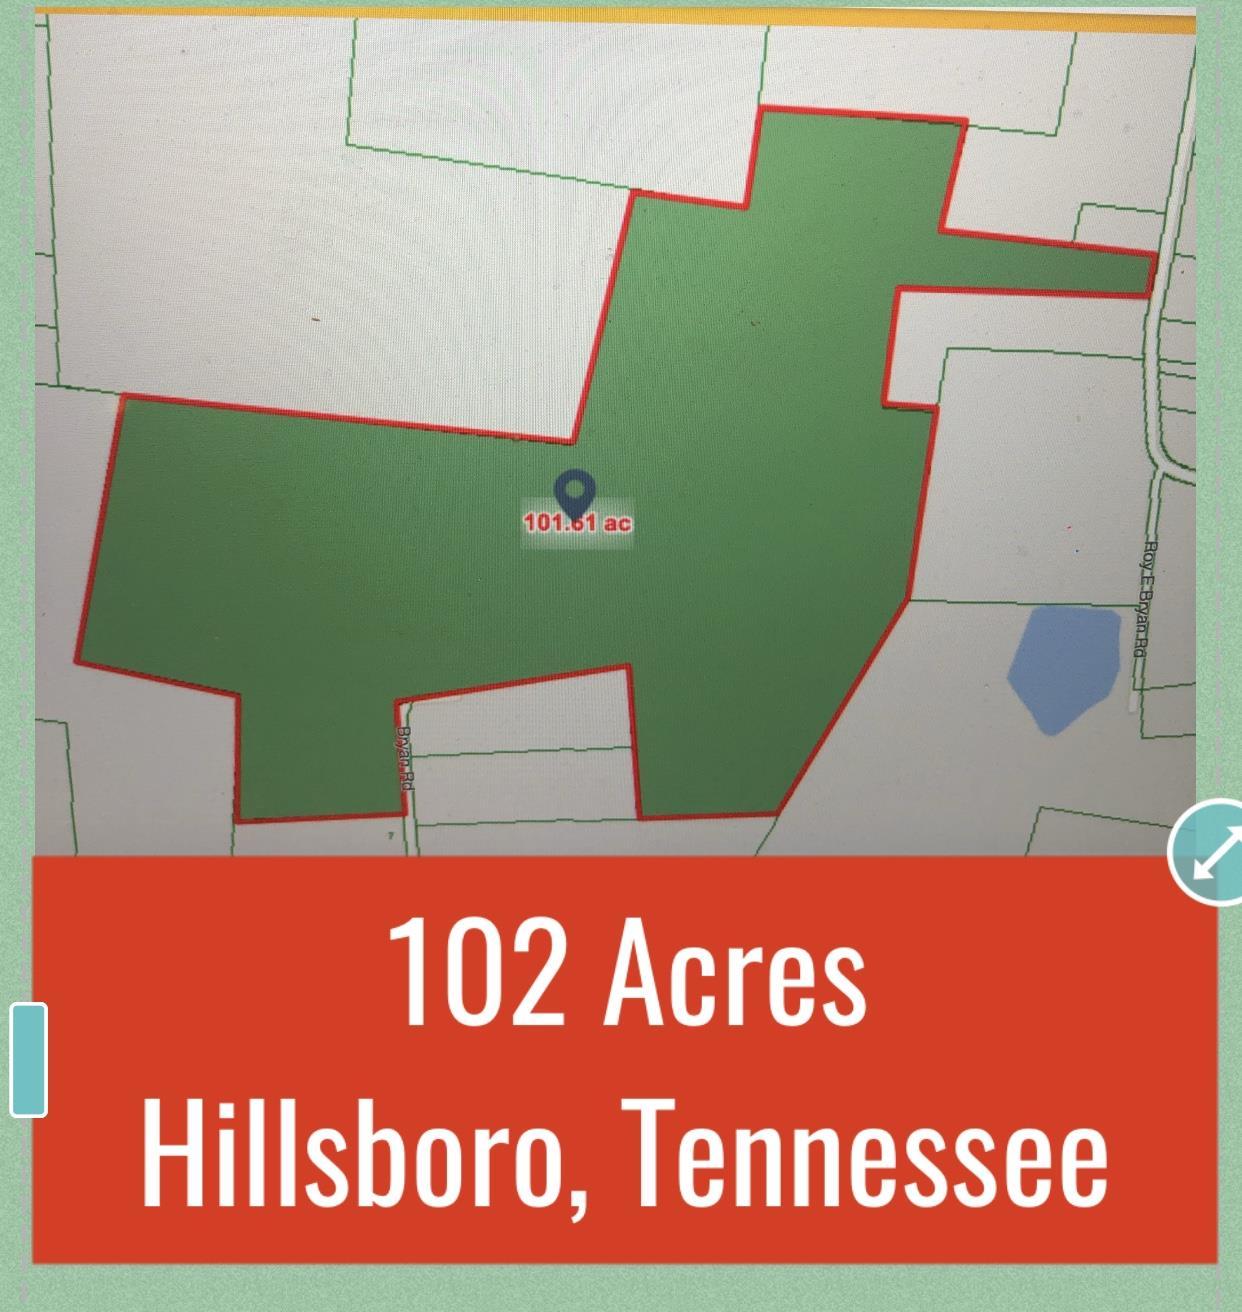 0 Simmons Rd (102 acres), Hillsboro, TN 37342 - Hillsboro, TN real estate listing